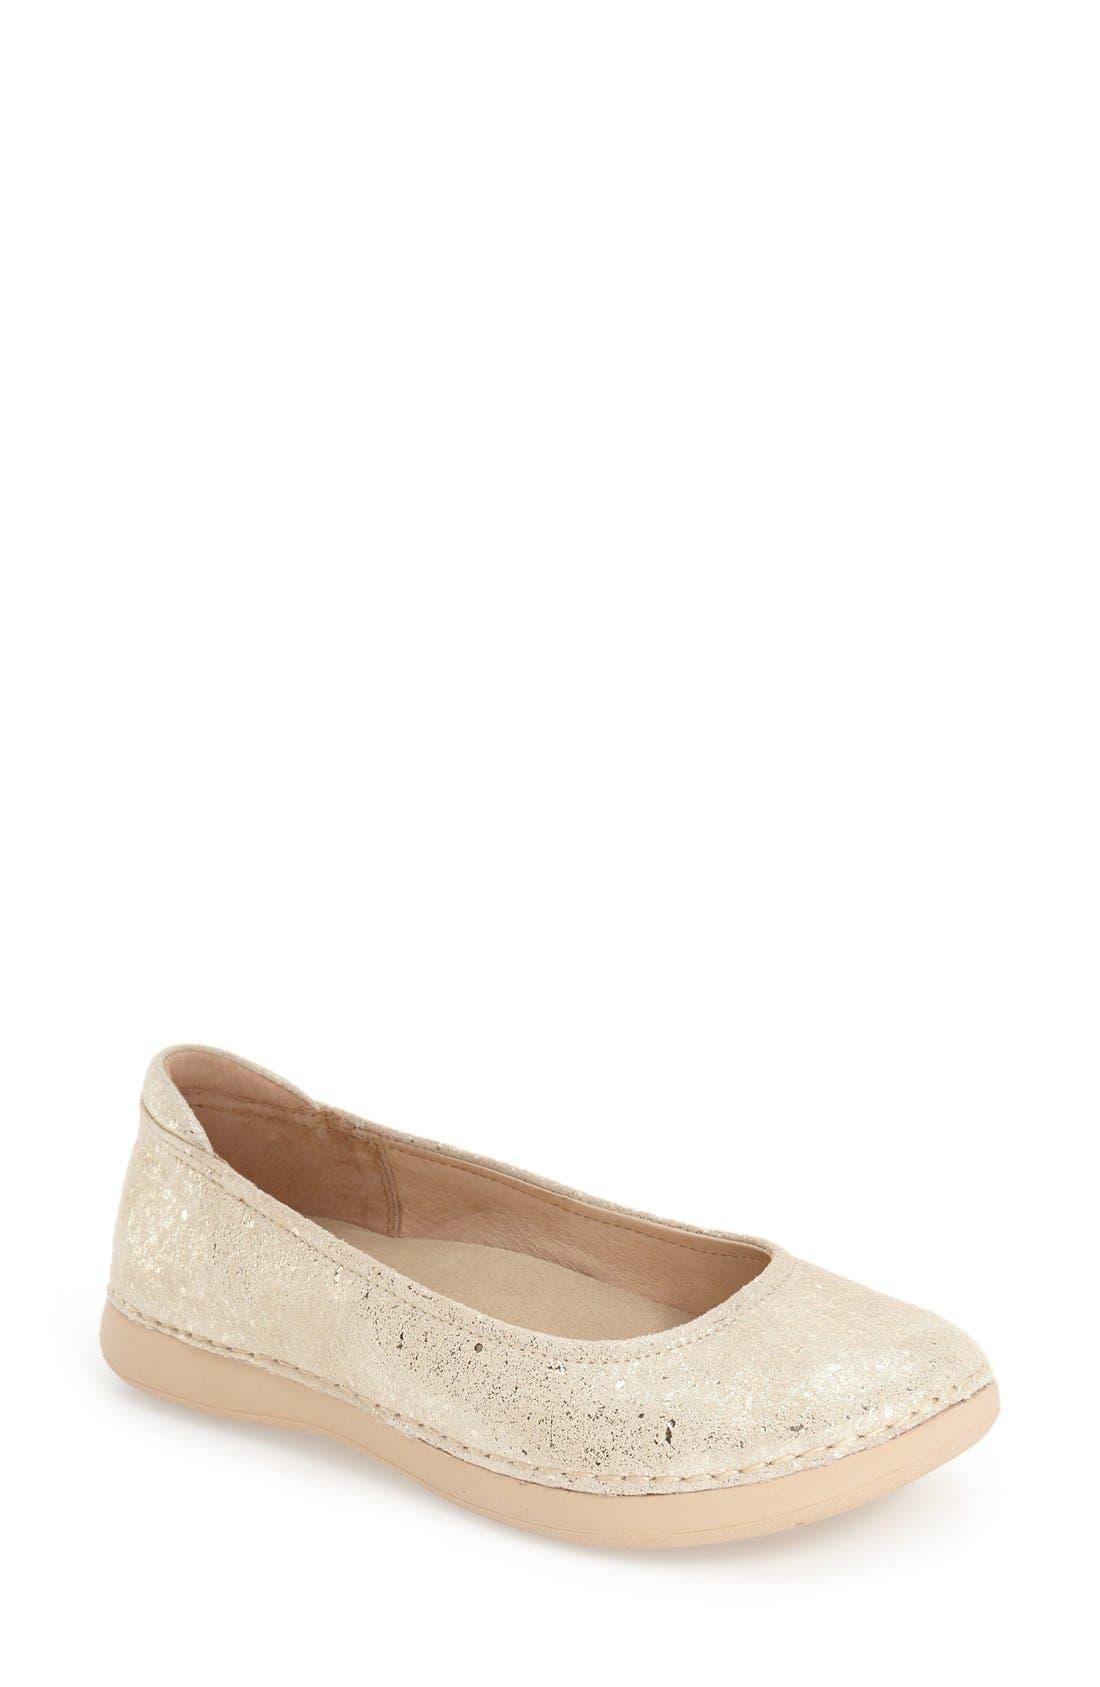 Alegria Petal Ballet Flat (Women)